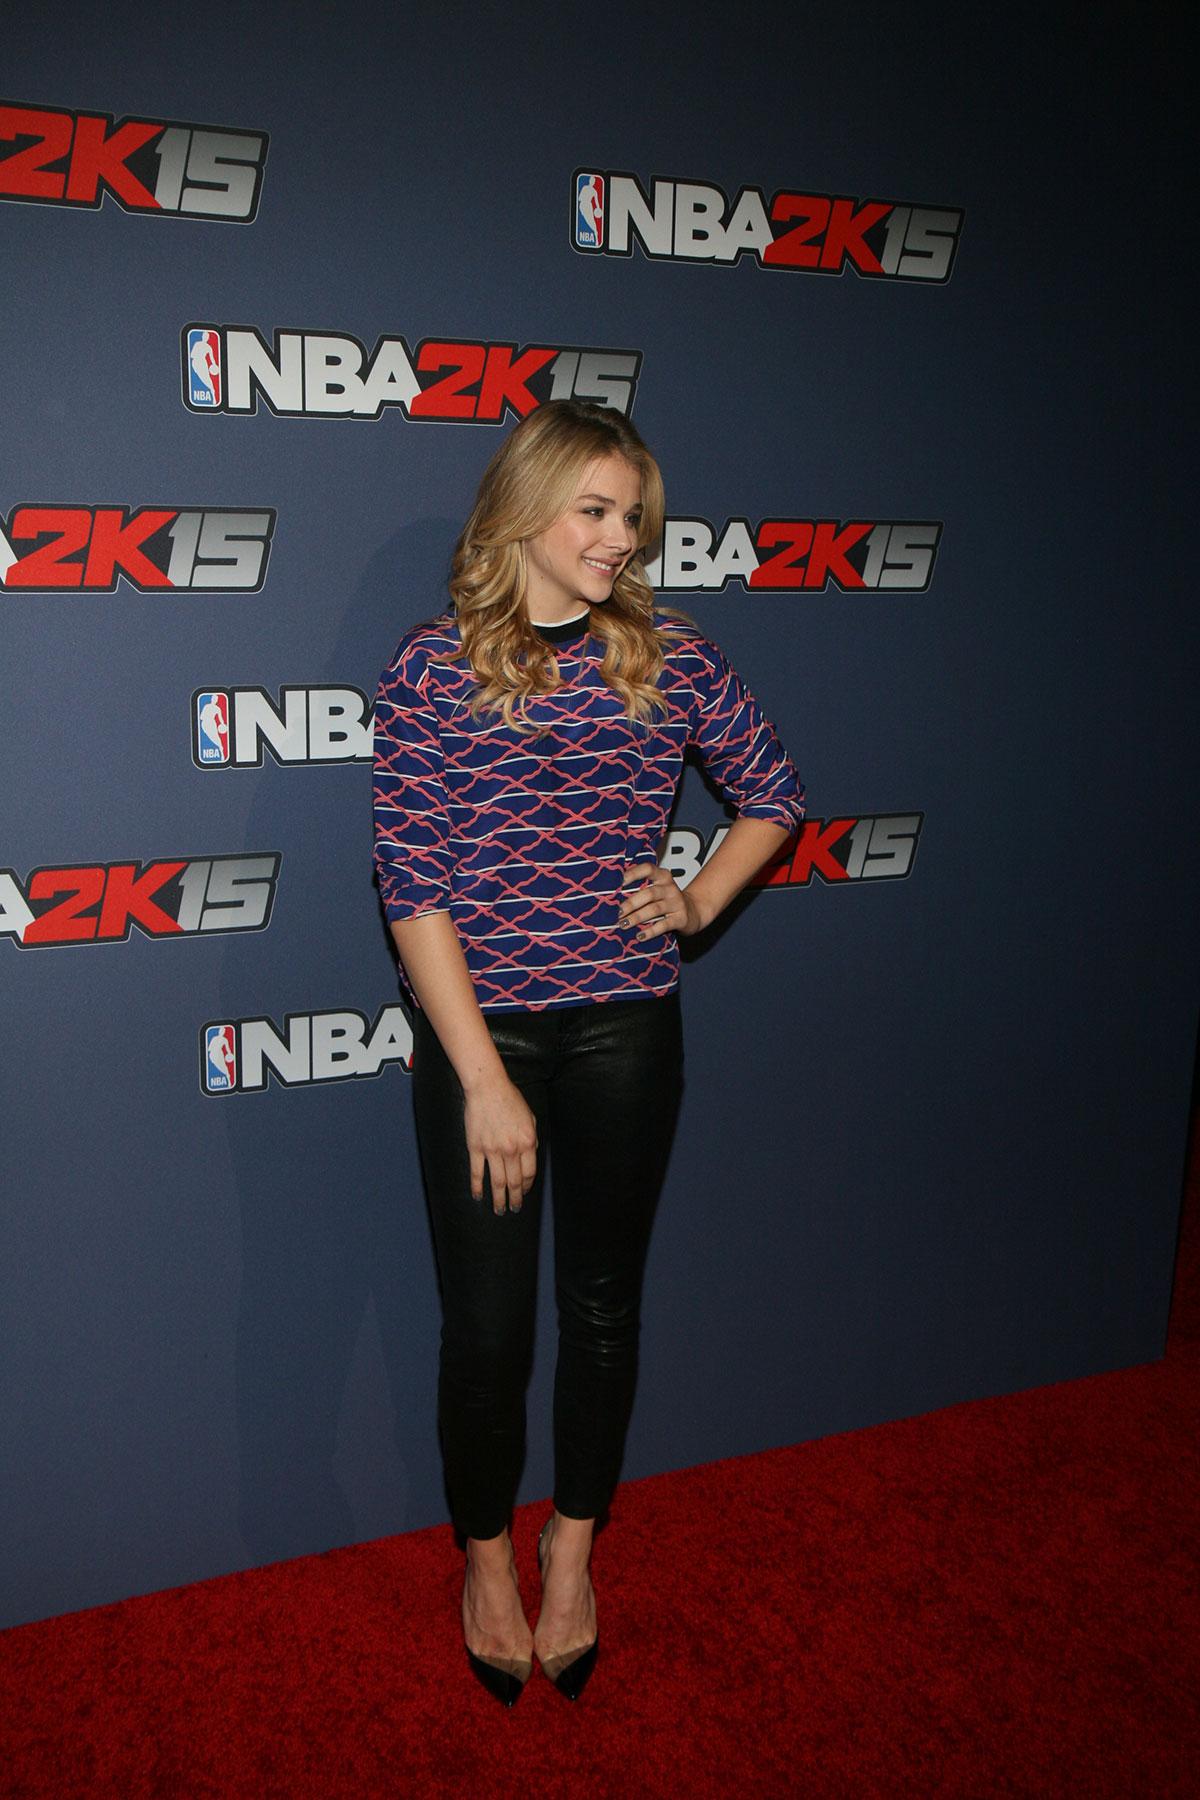 Chloe Moretz attends NBA 2K15 Launch Celebration in New York